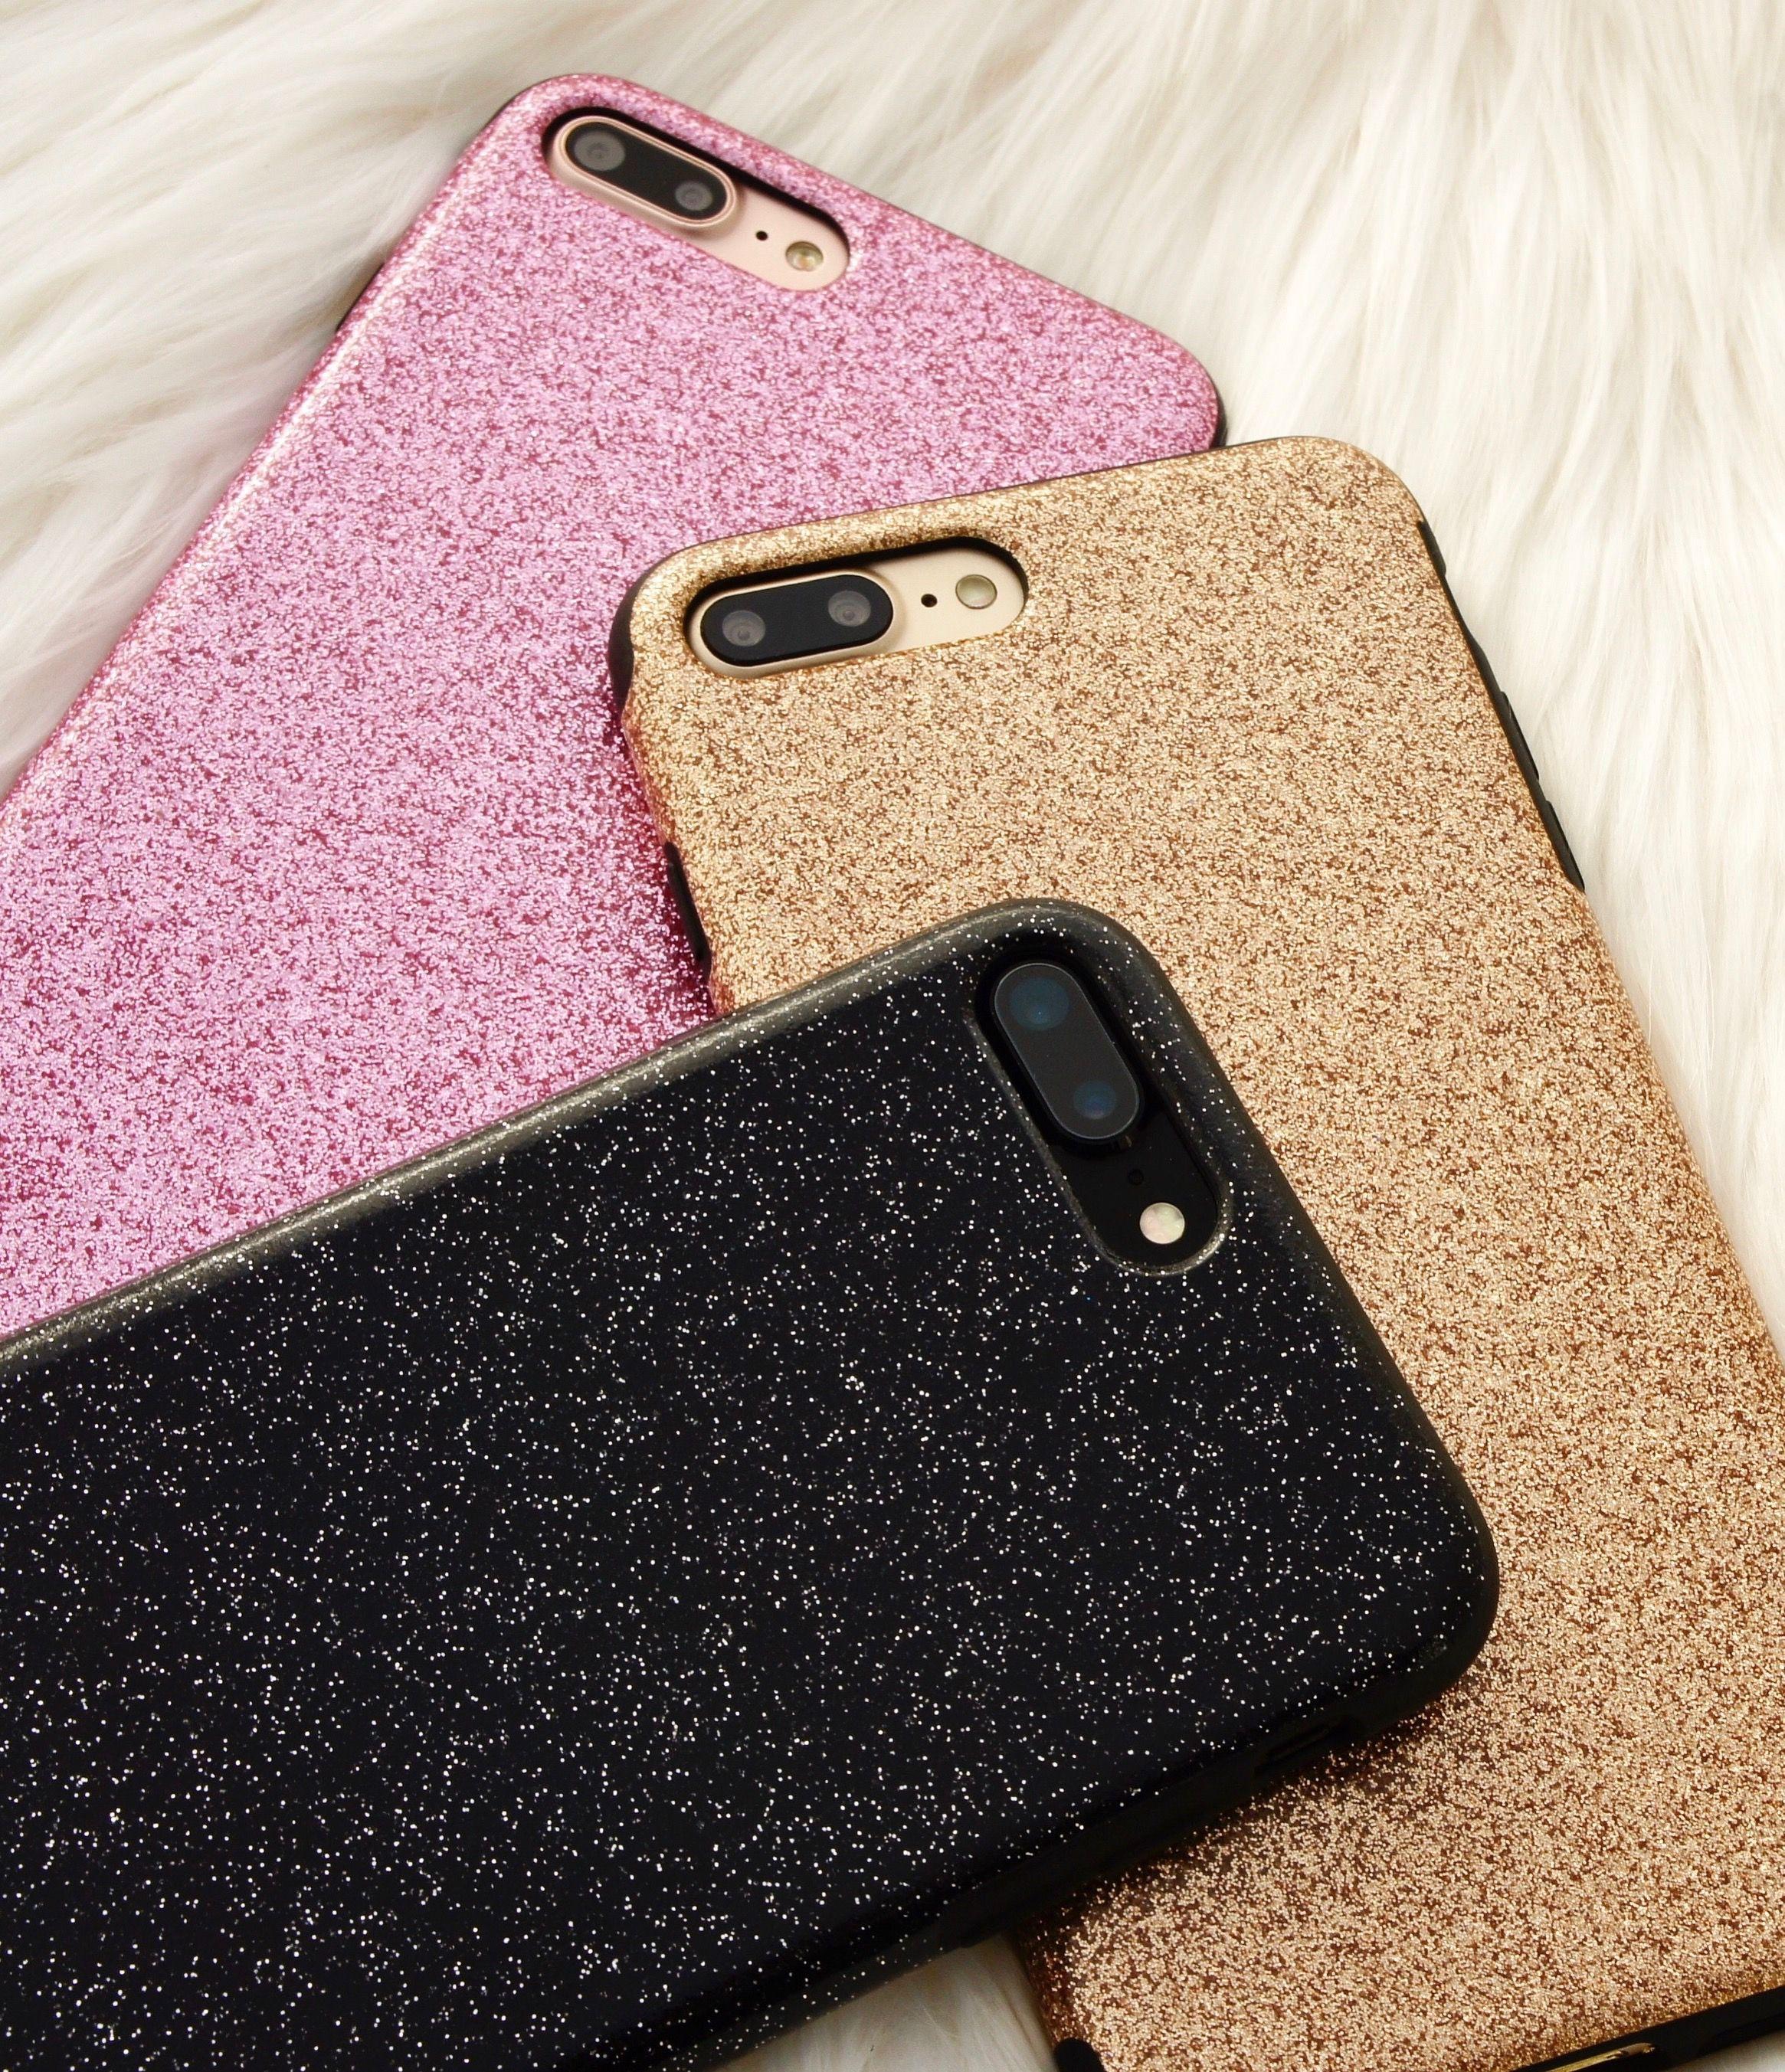 iphone 7 phone cases black glitter